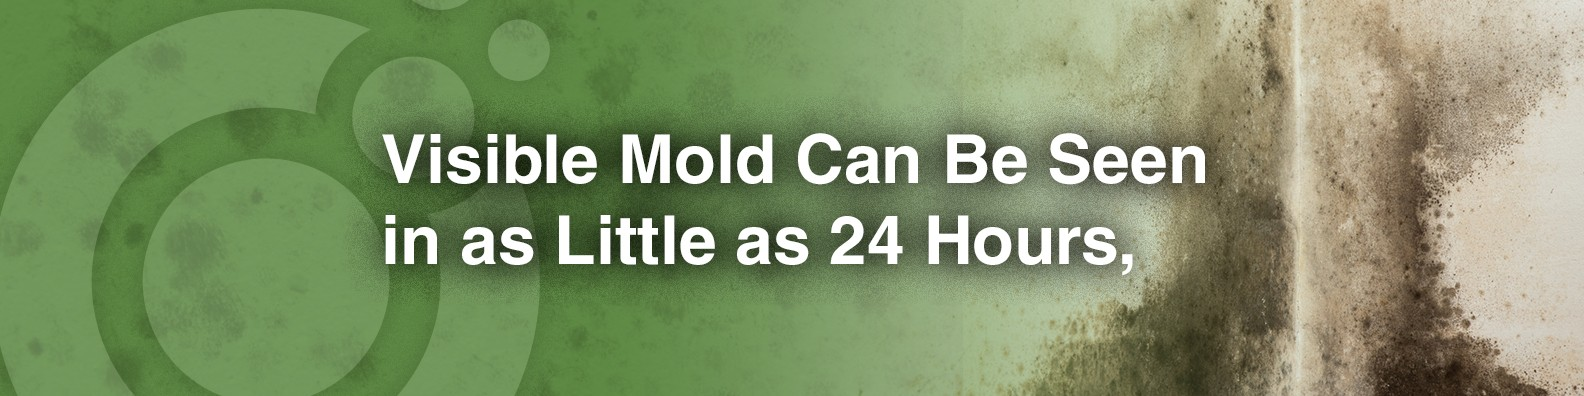 Mold Inspection Sciences, Inc  | LinkedIn